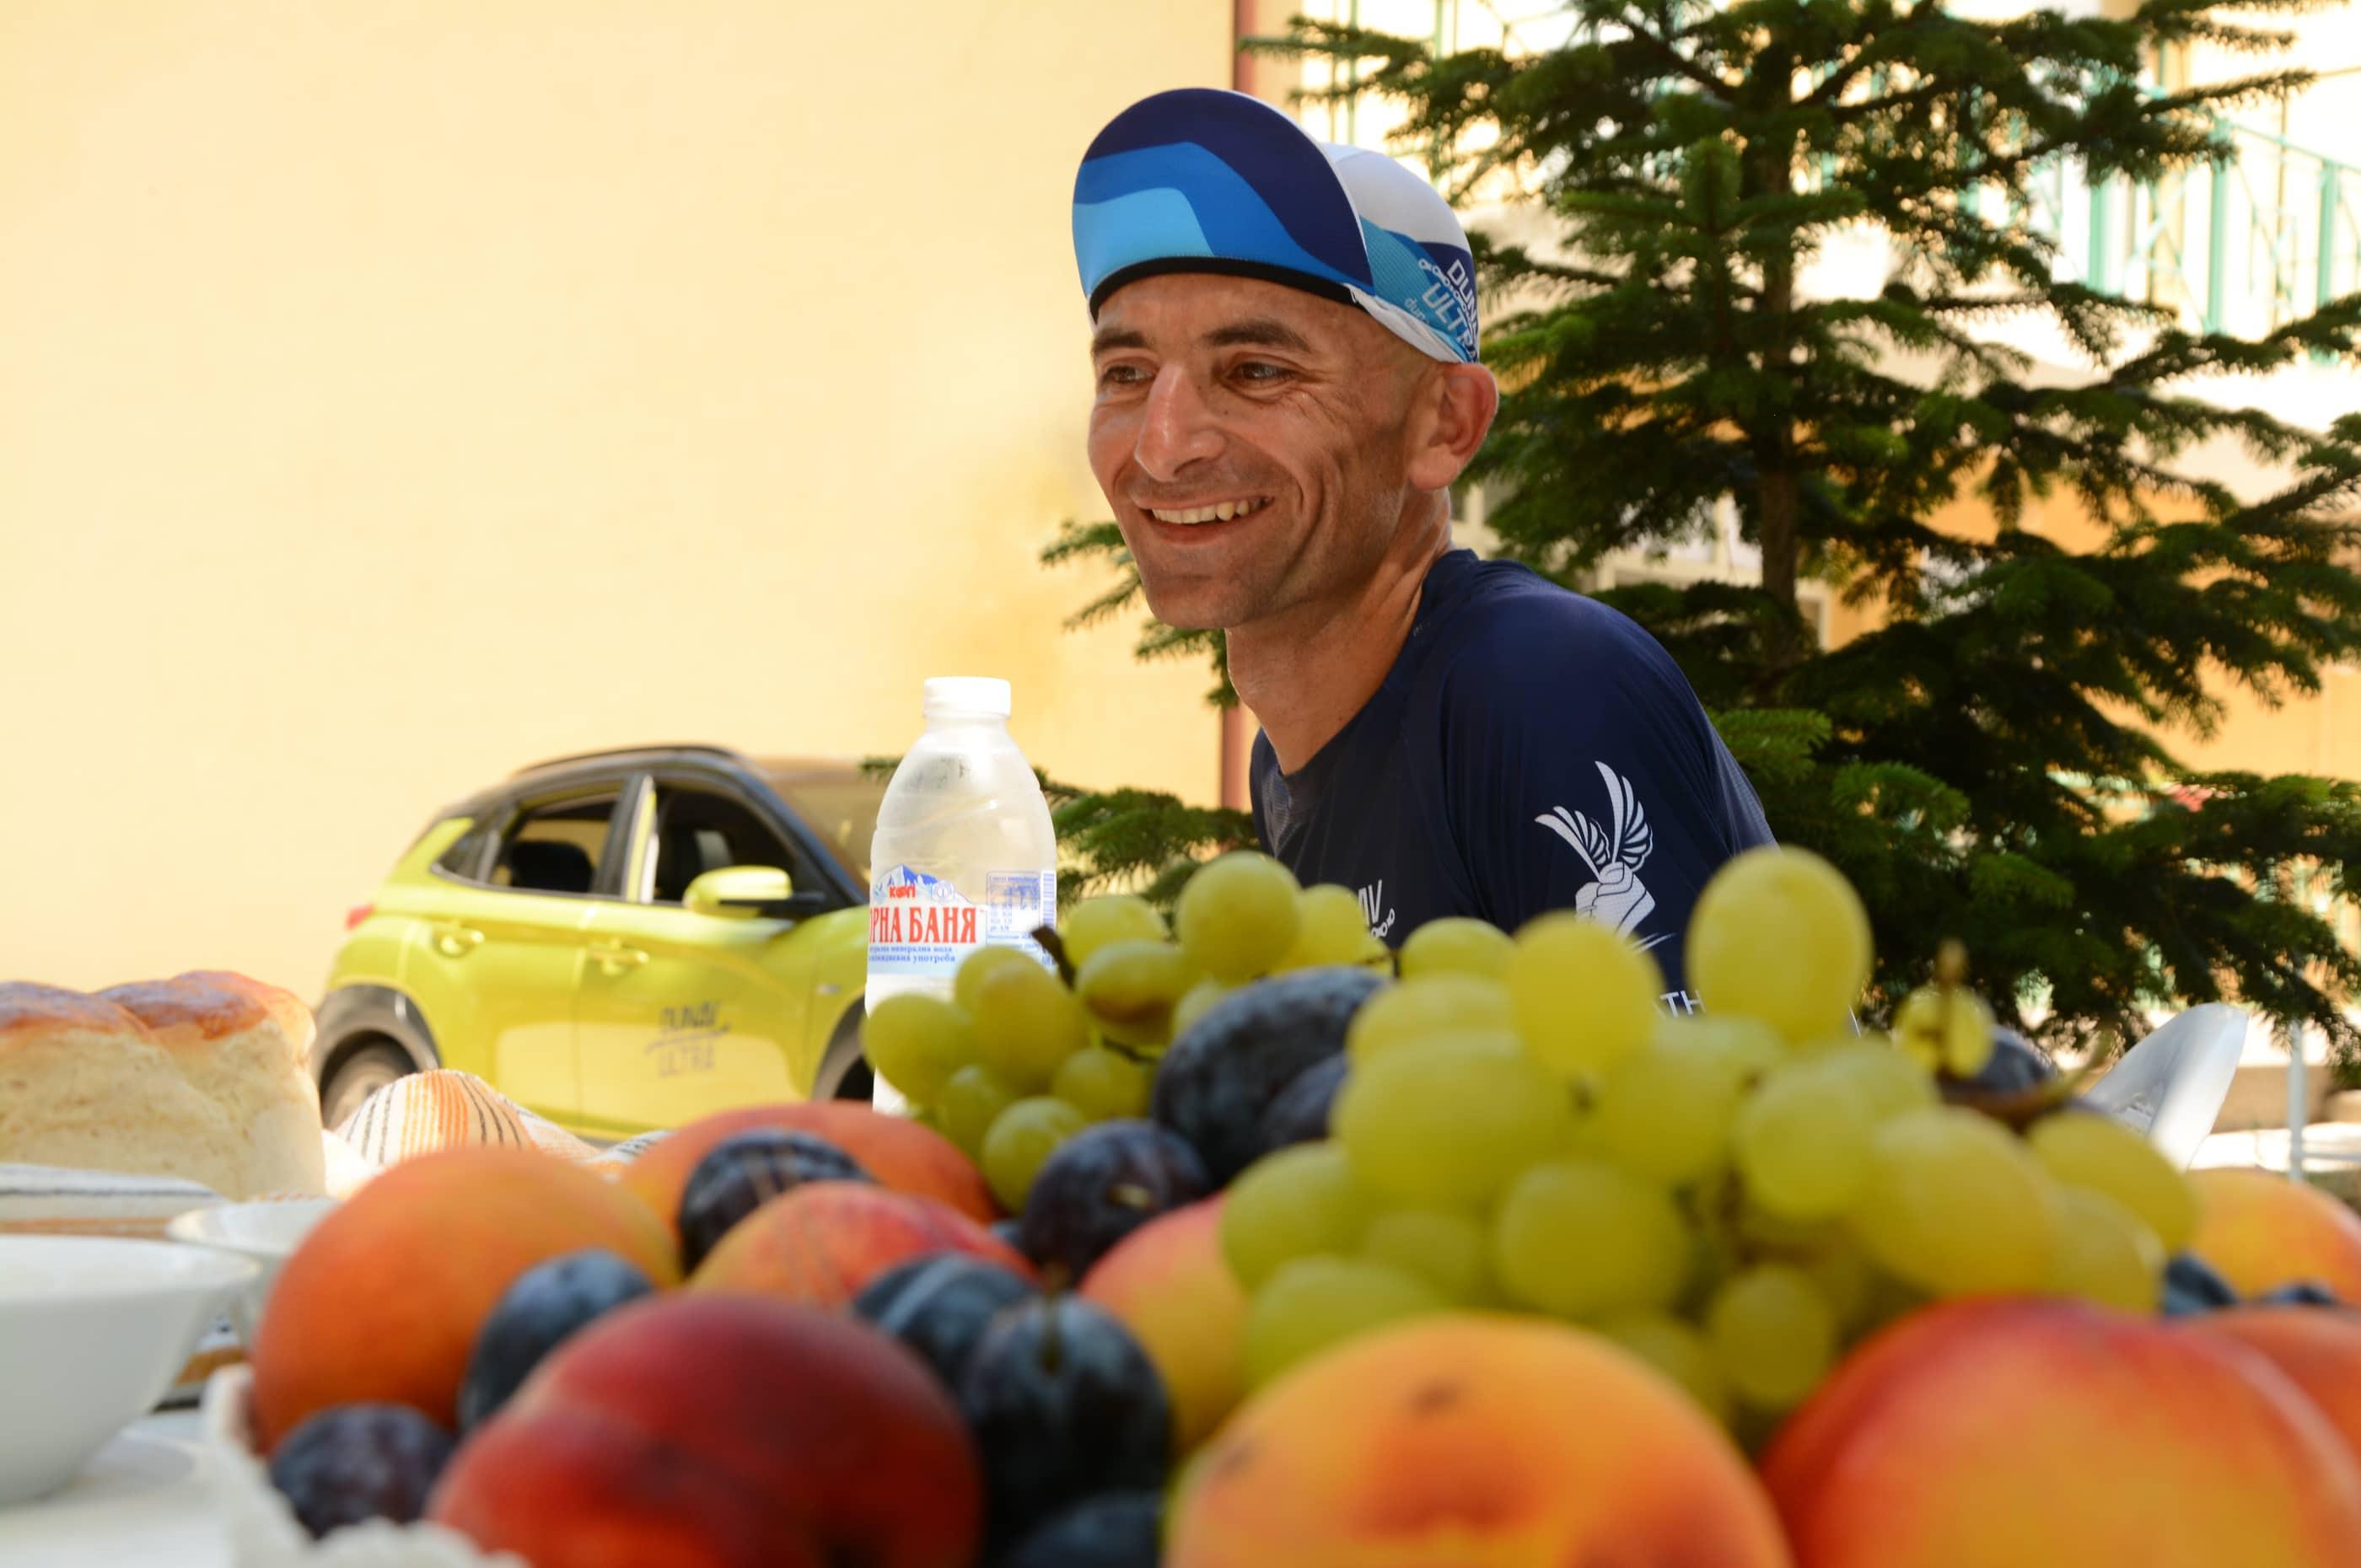 dunav ultra the marathon day 5 – 20